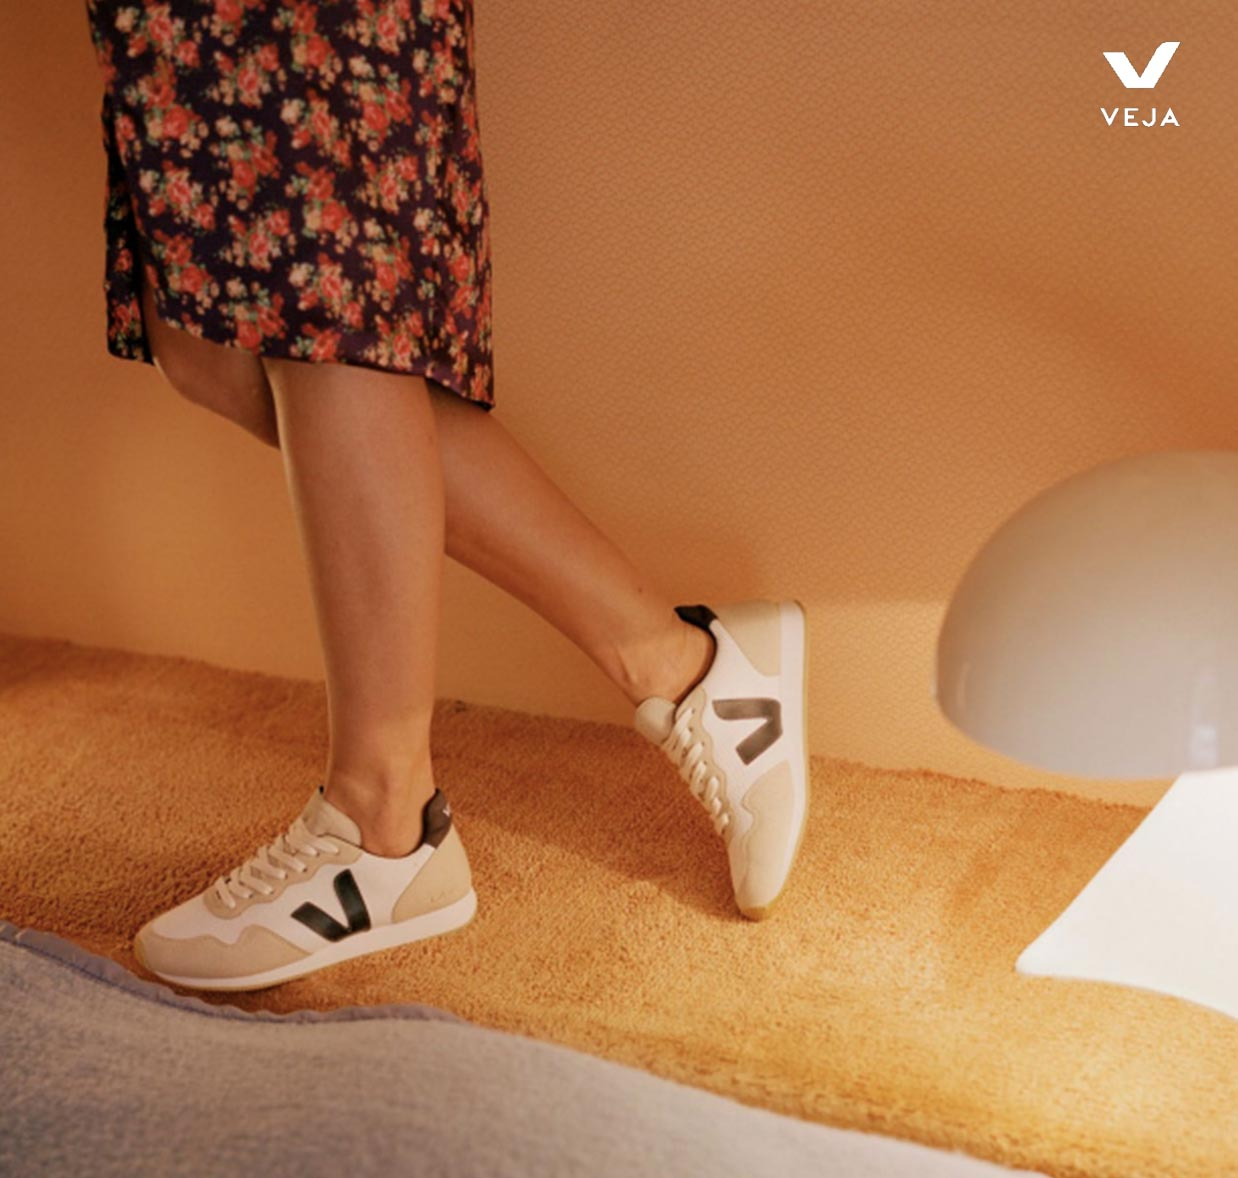 NEW! | Vegan sneakers by VEJA | Shop now!